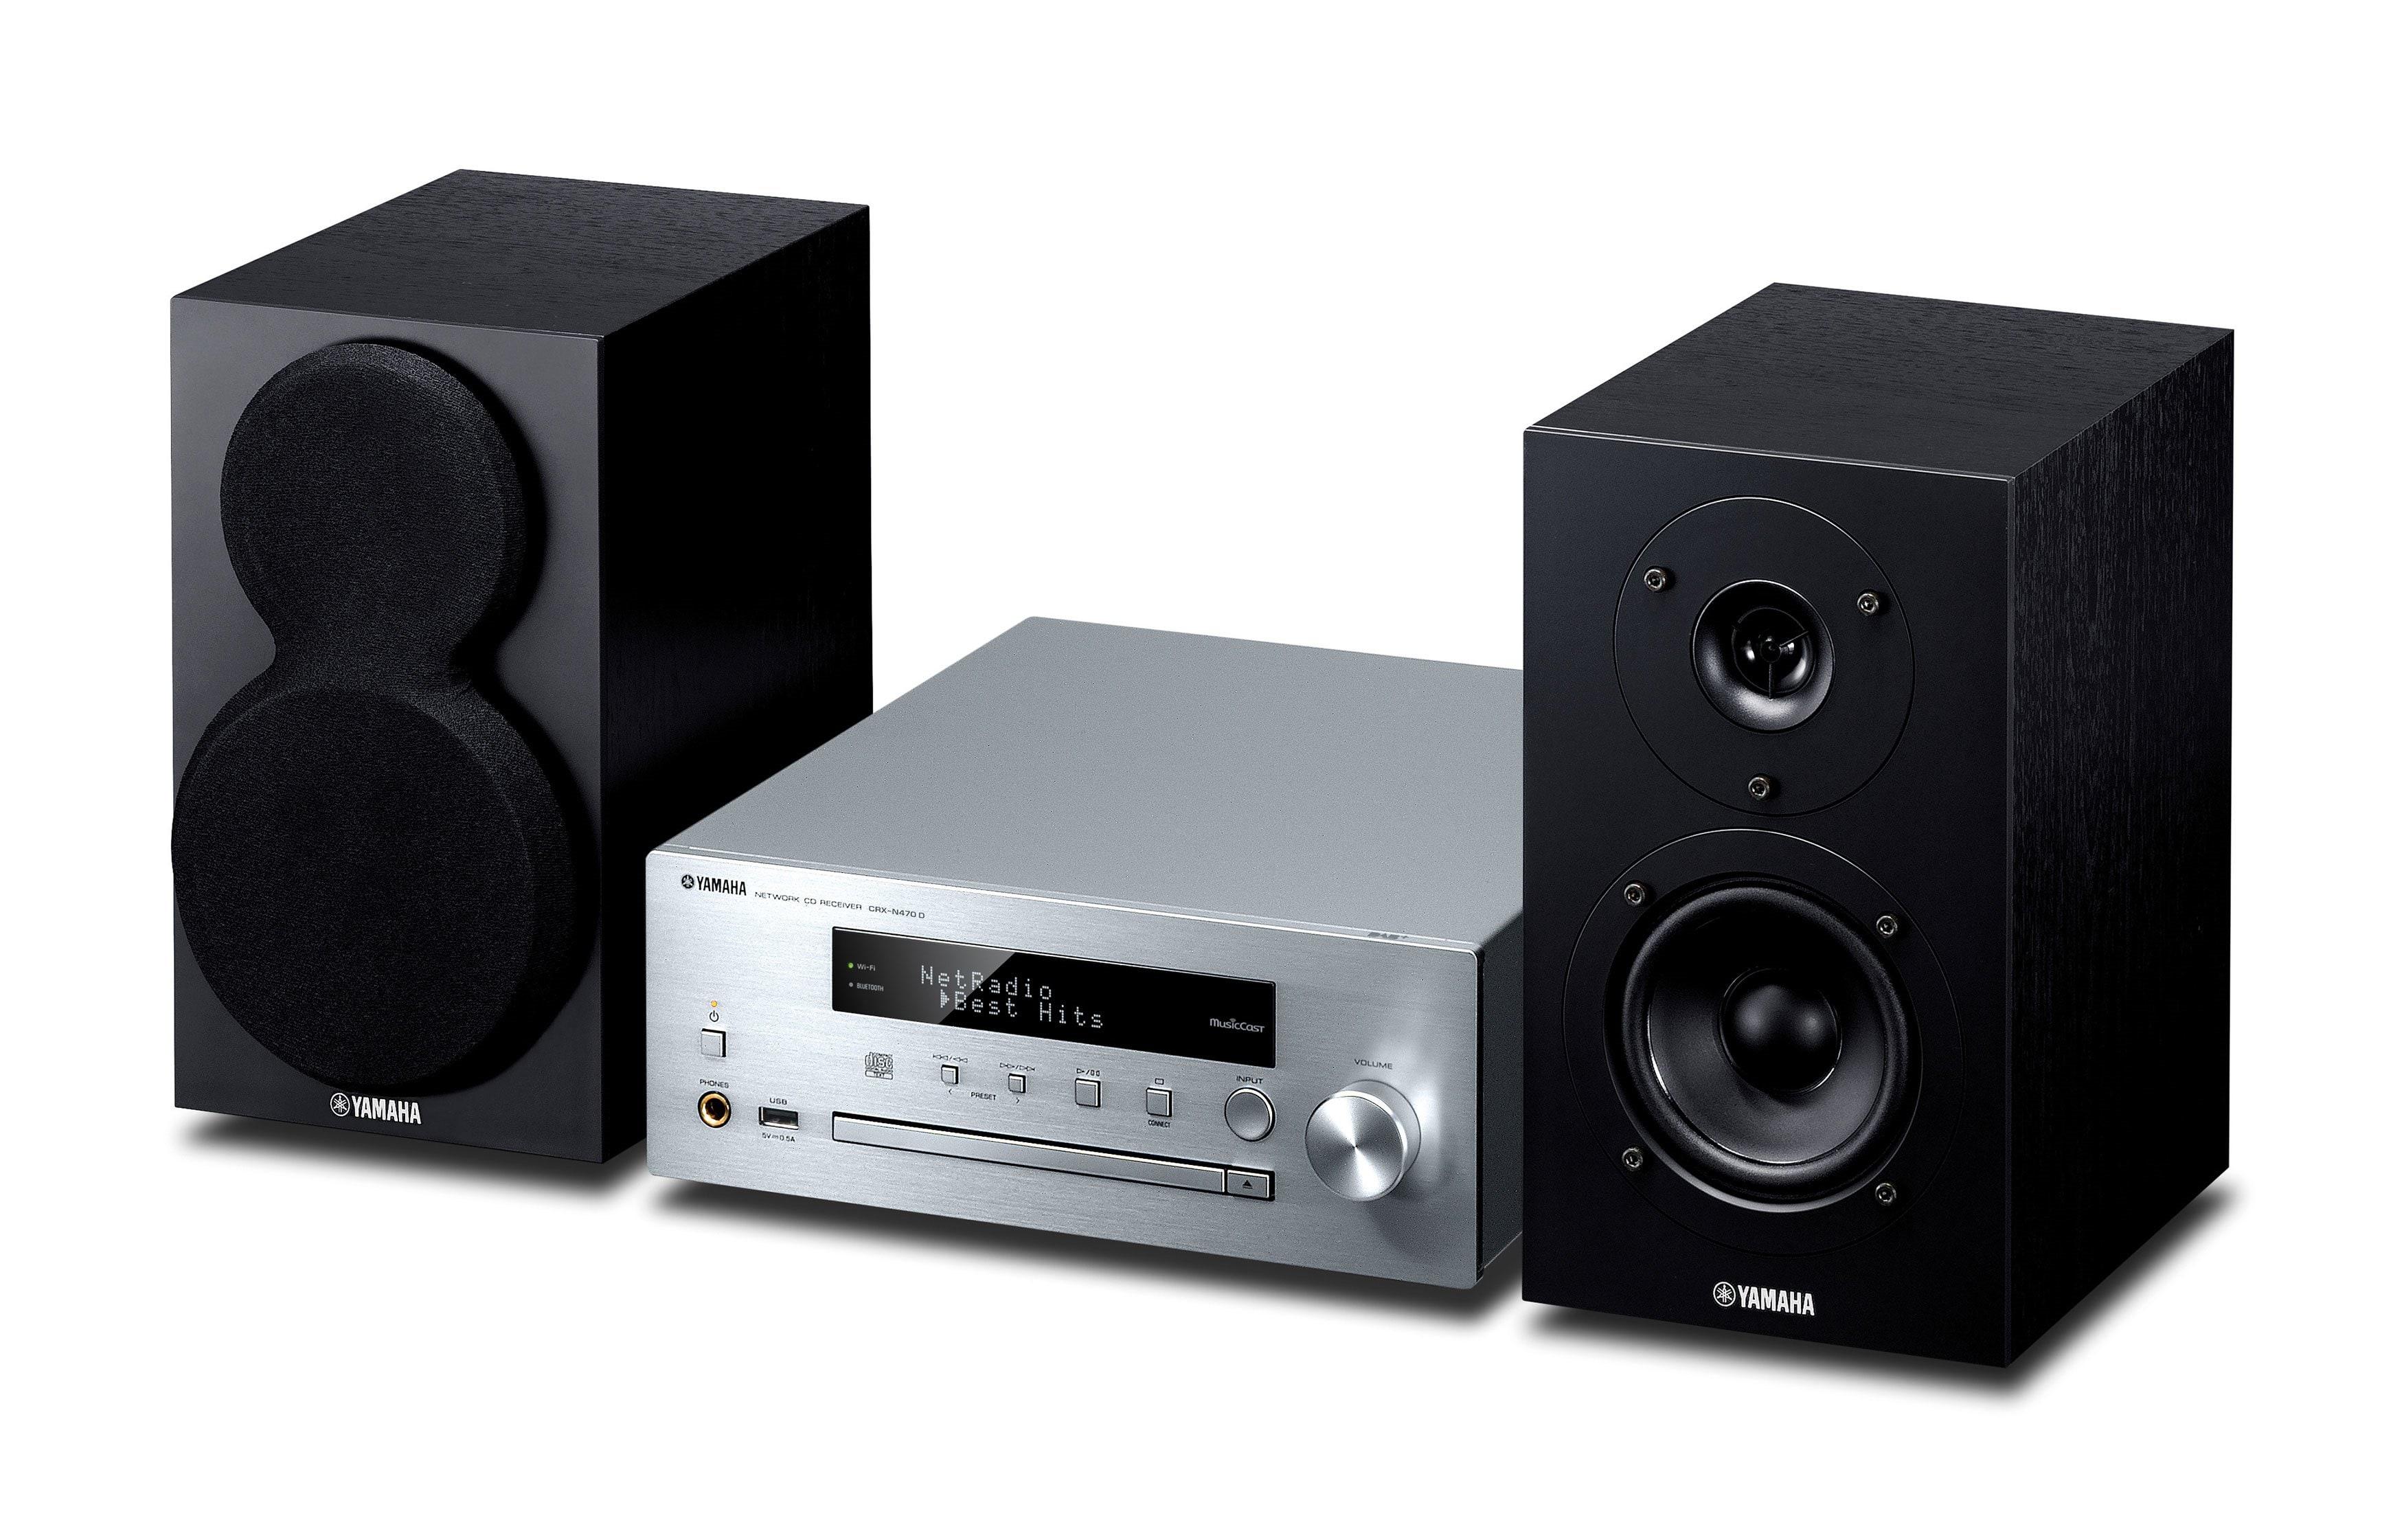 HiFi-Systeme - Audio & Video - Produkte - Yamaha - Deutschland